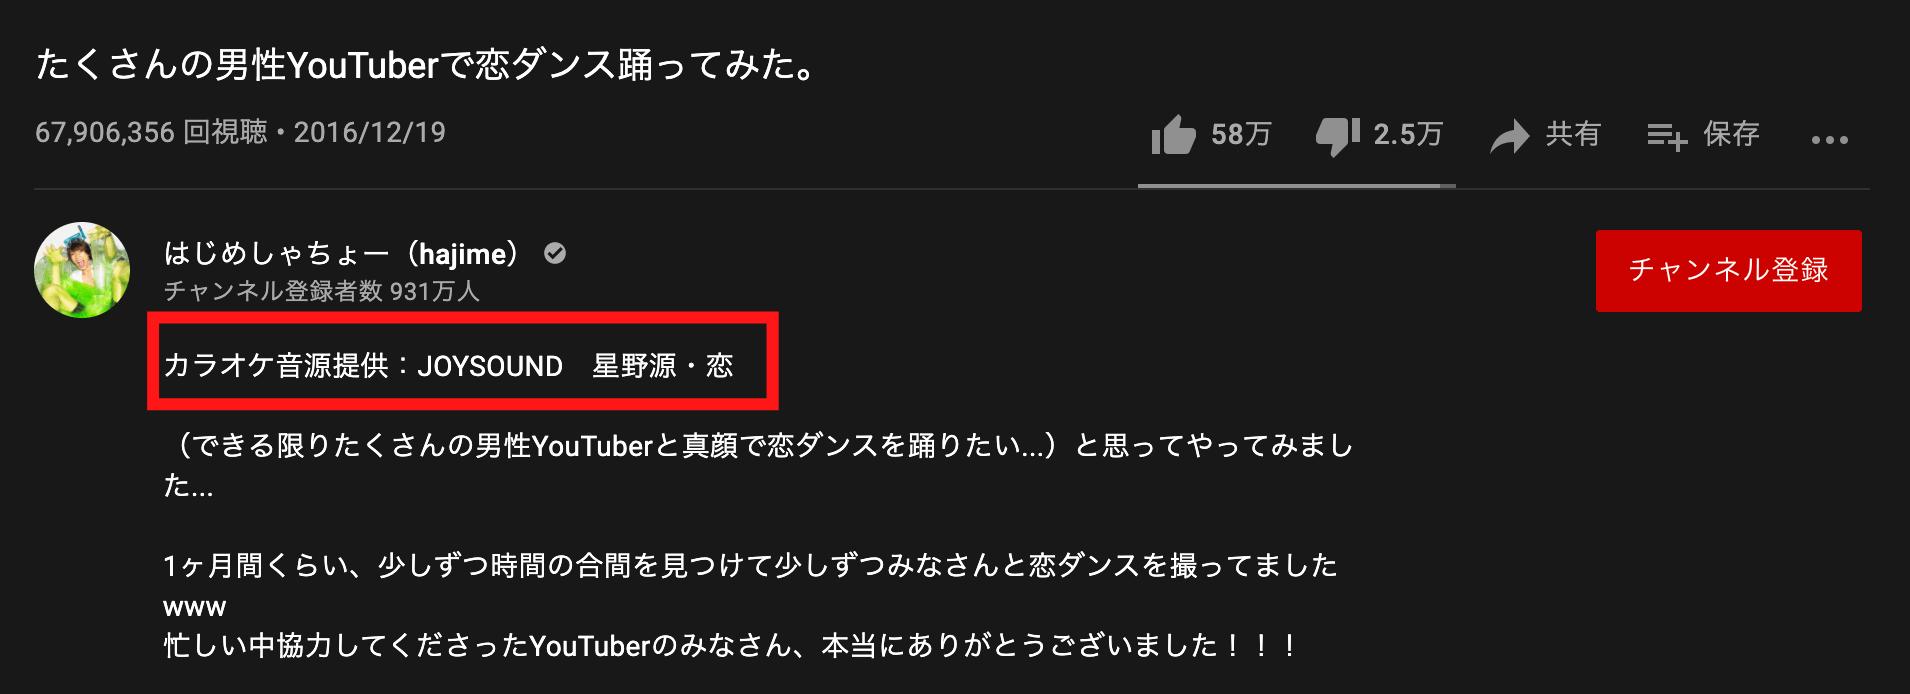 youtube-music credit